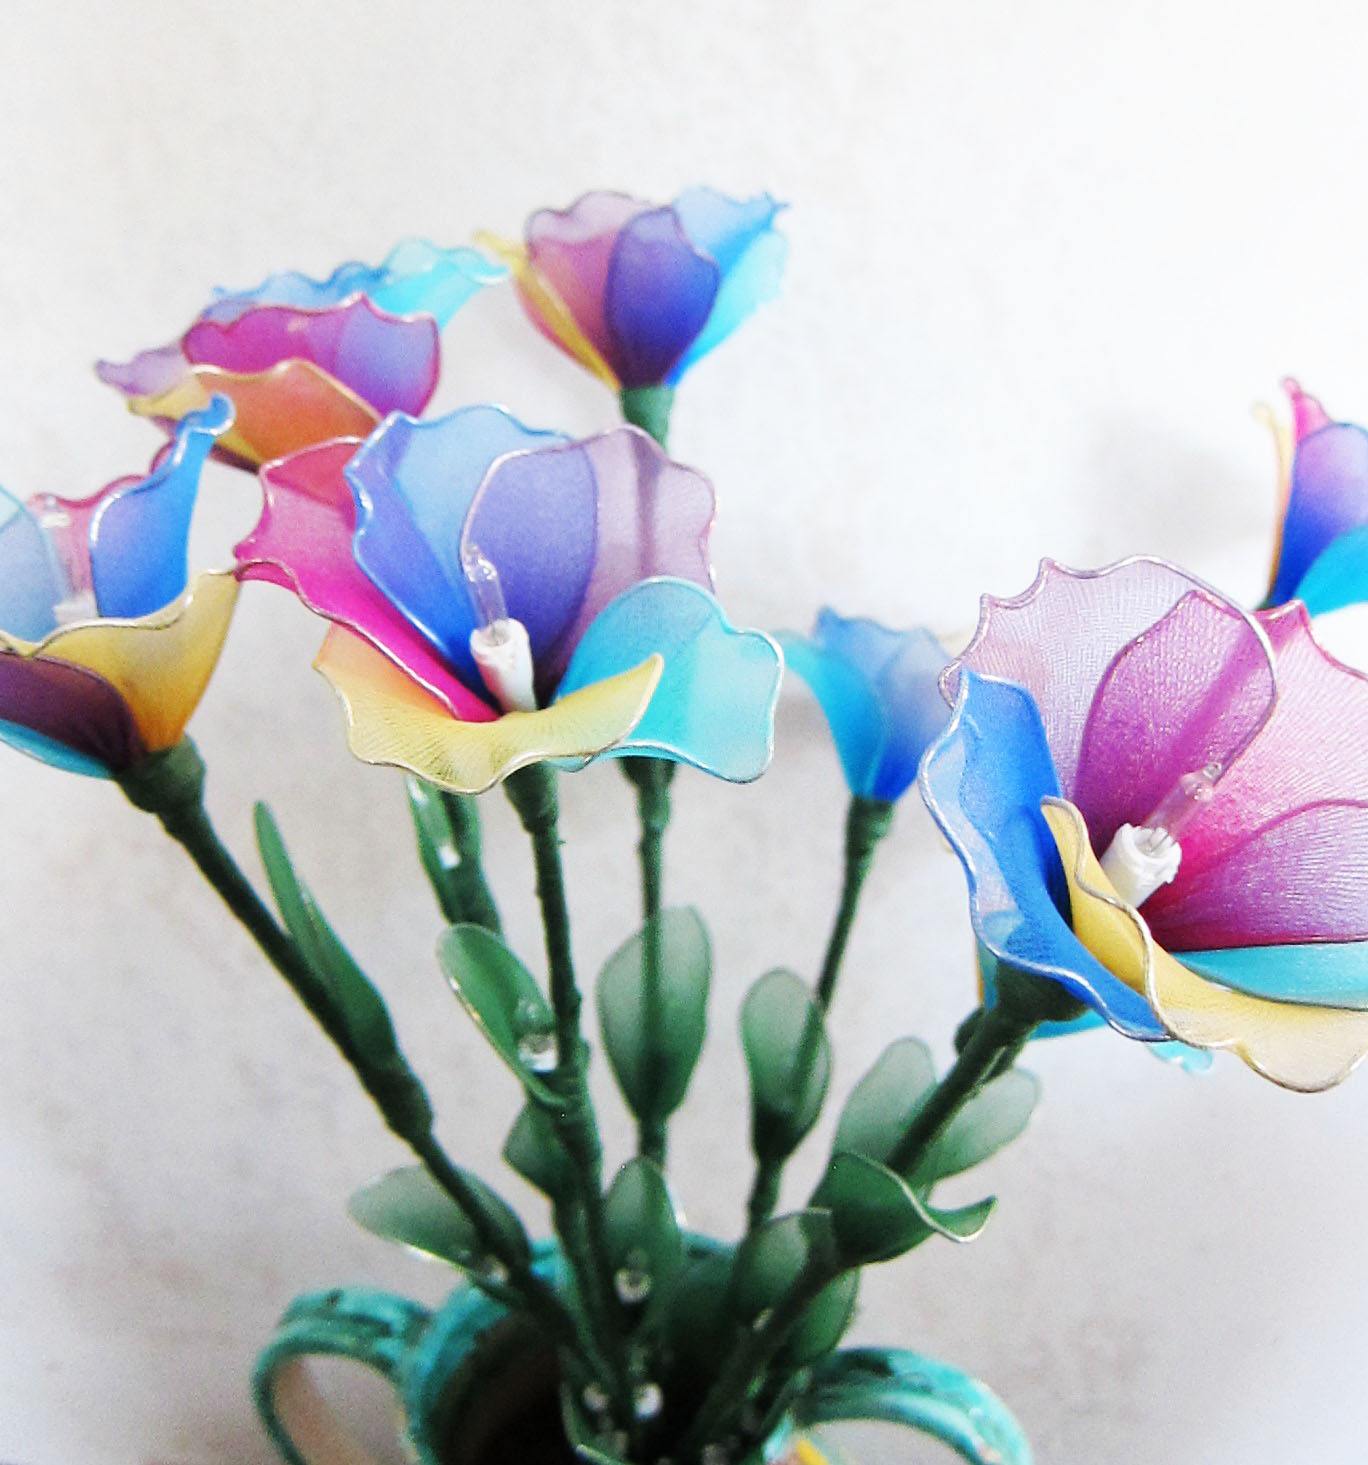 Flower Lights_4064